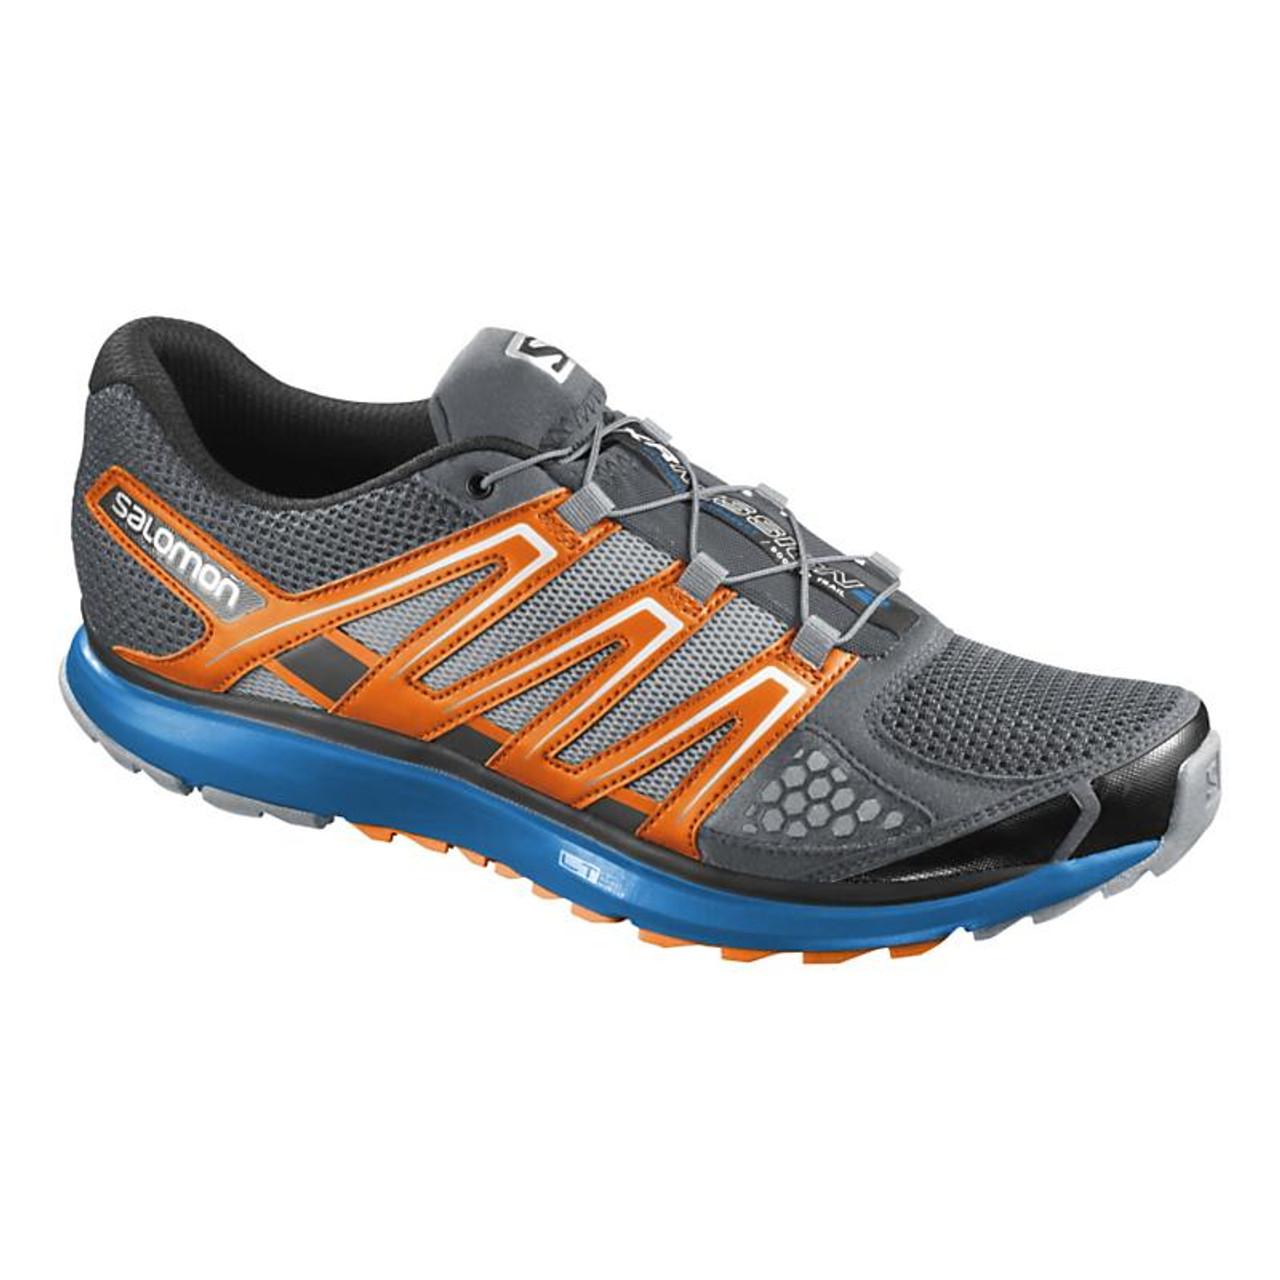 bff5c1cda469ce Men s Salomon X-Scream Trail Running Shoe